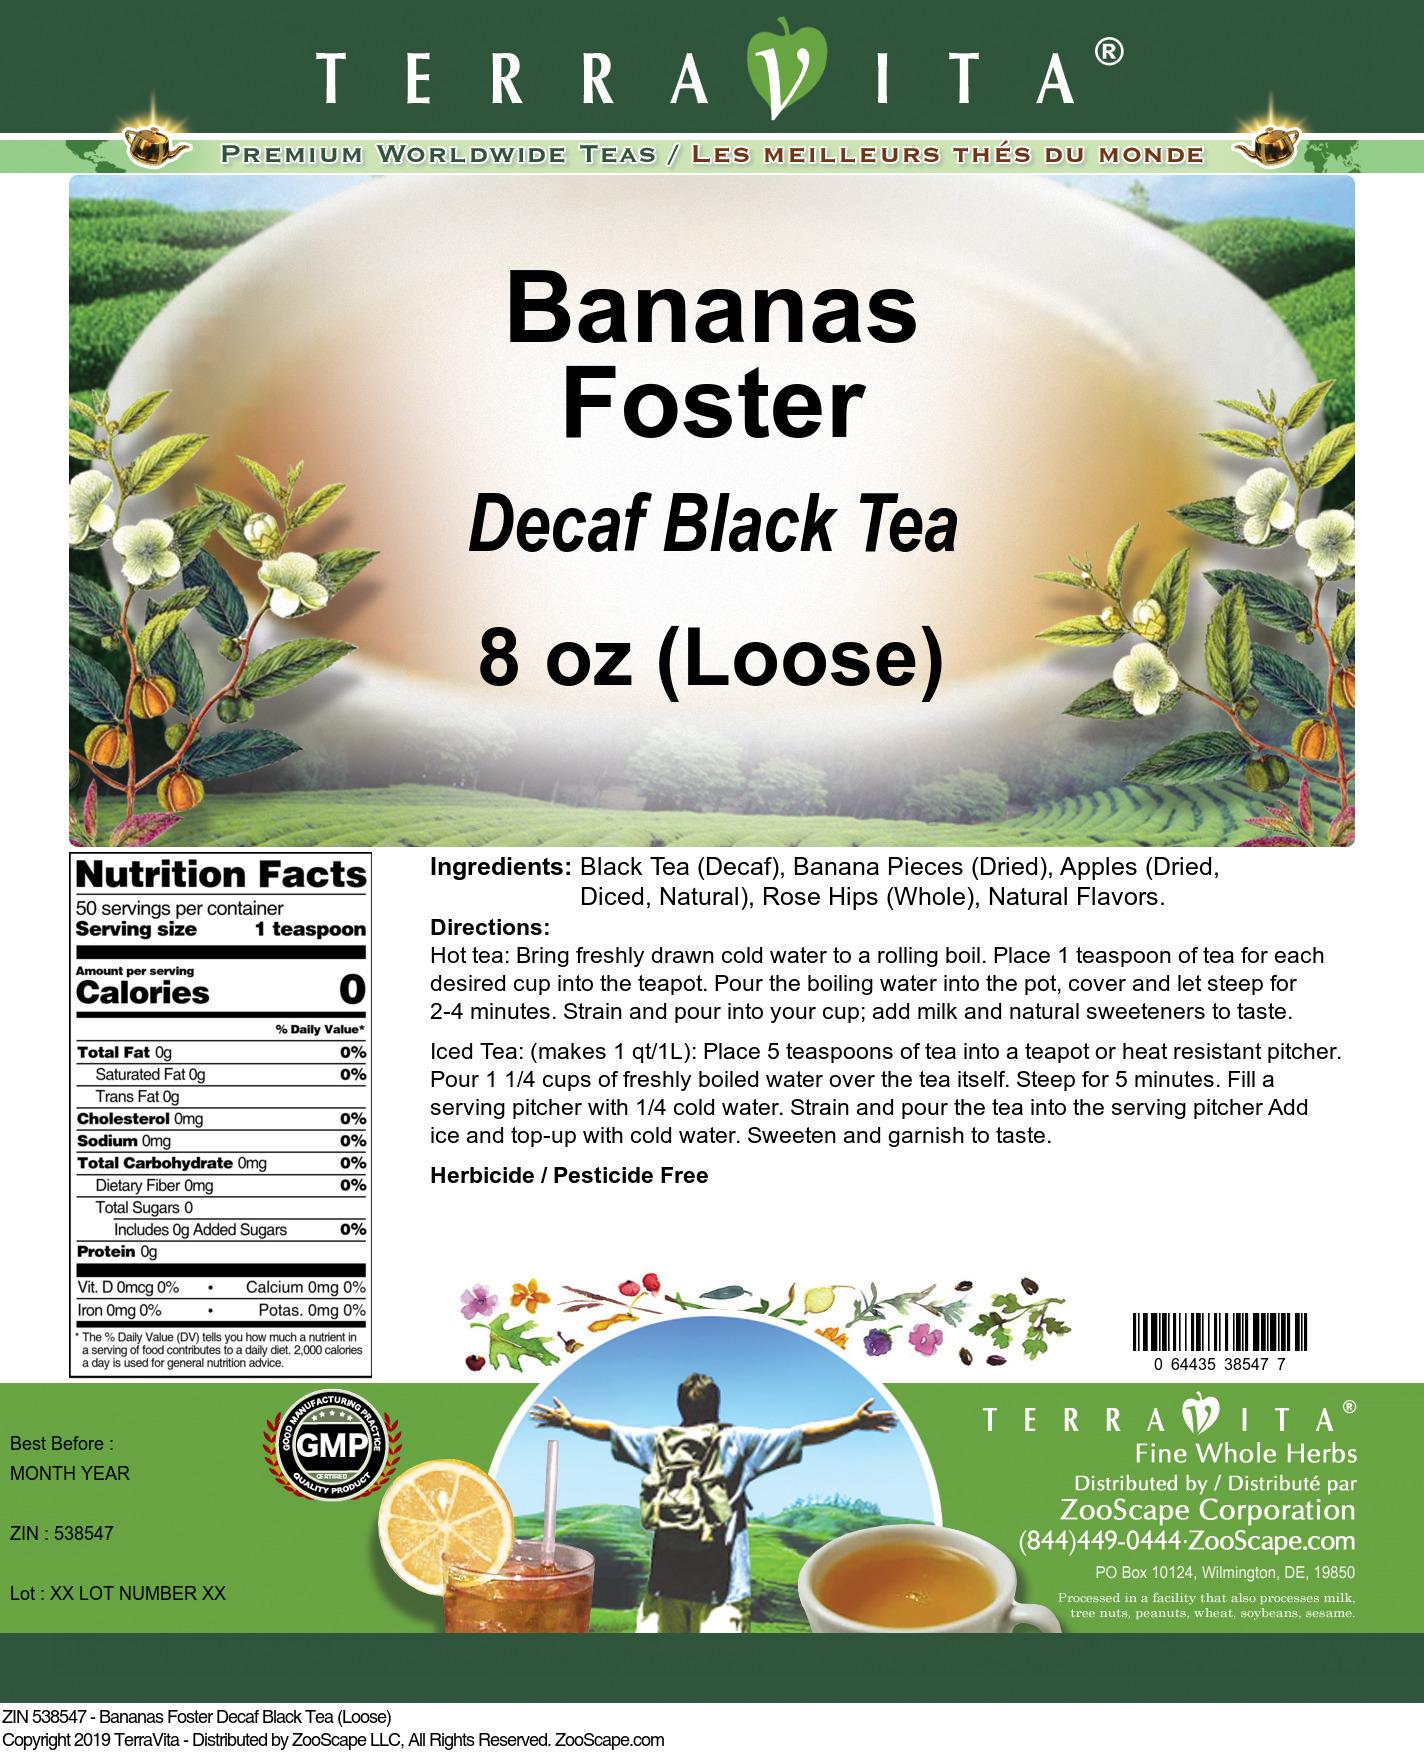 Banana Foster Decaf Black Tea